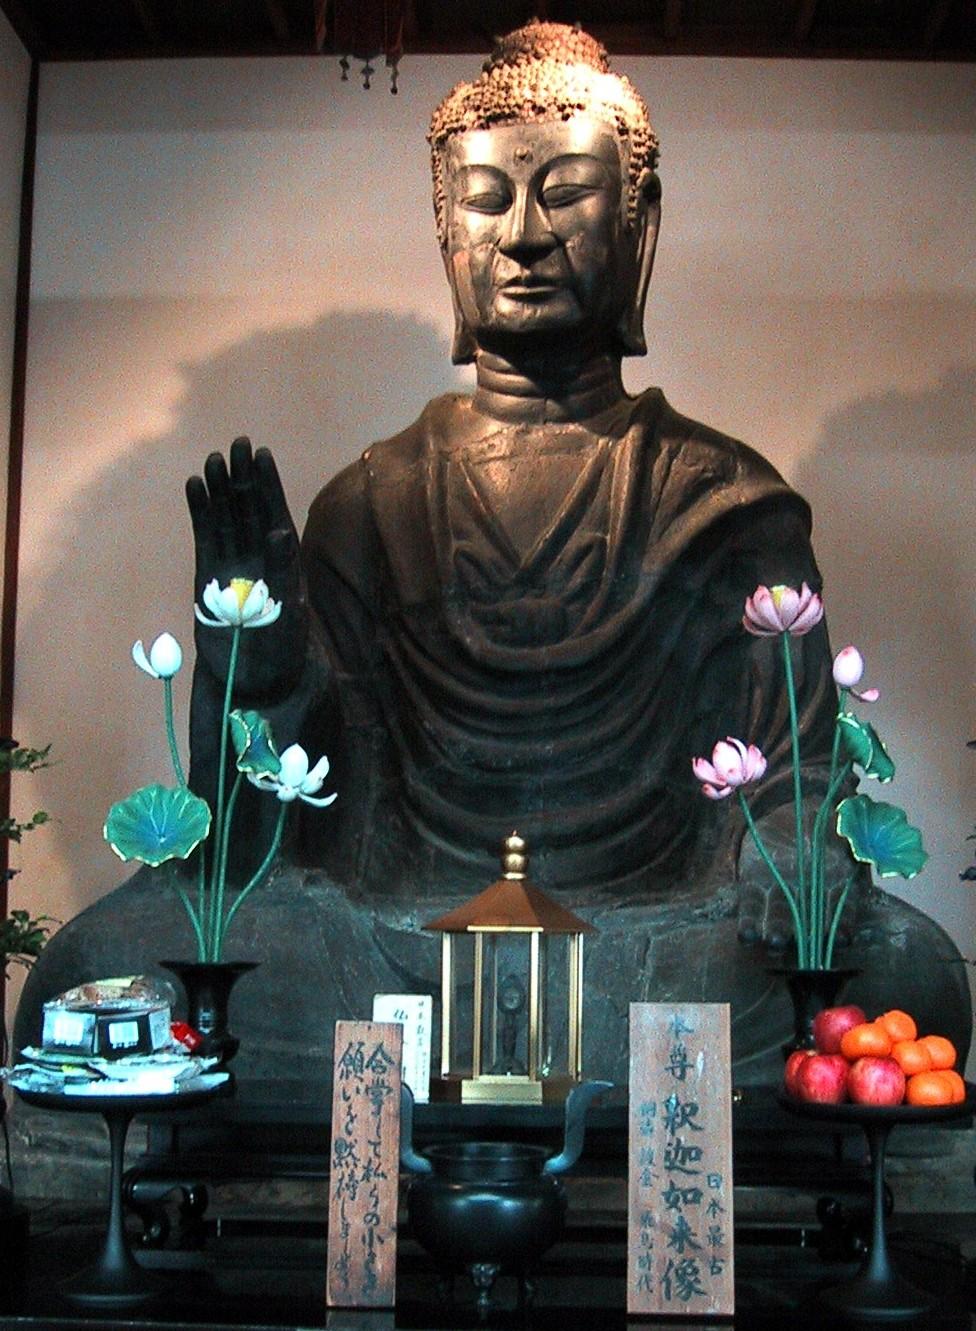 Buddha, trading philosophy